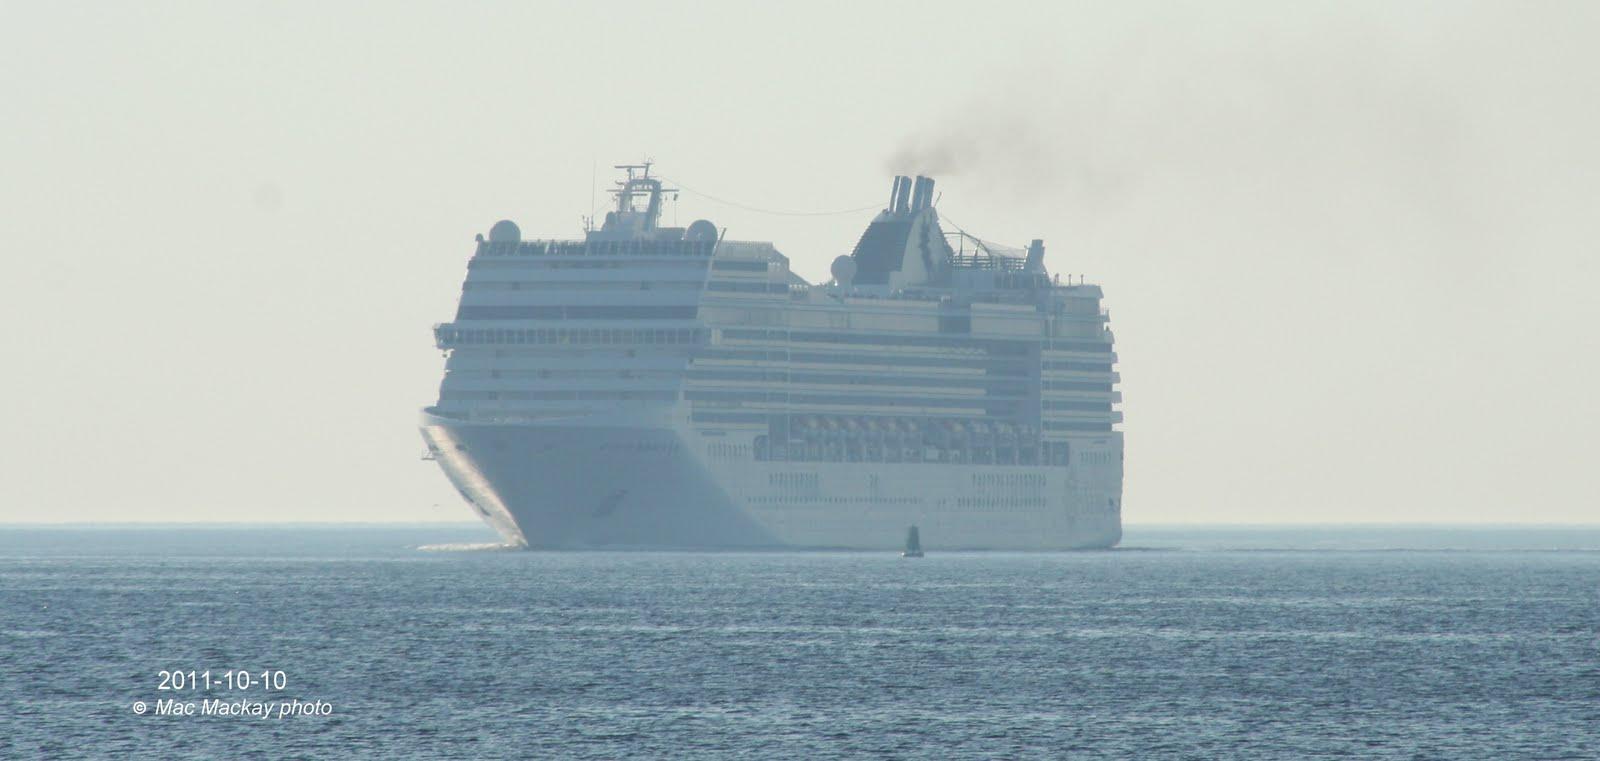 Shipfax: January 2012